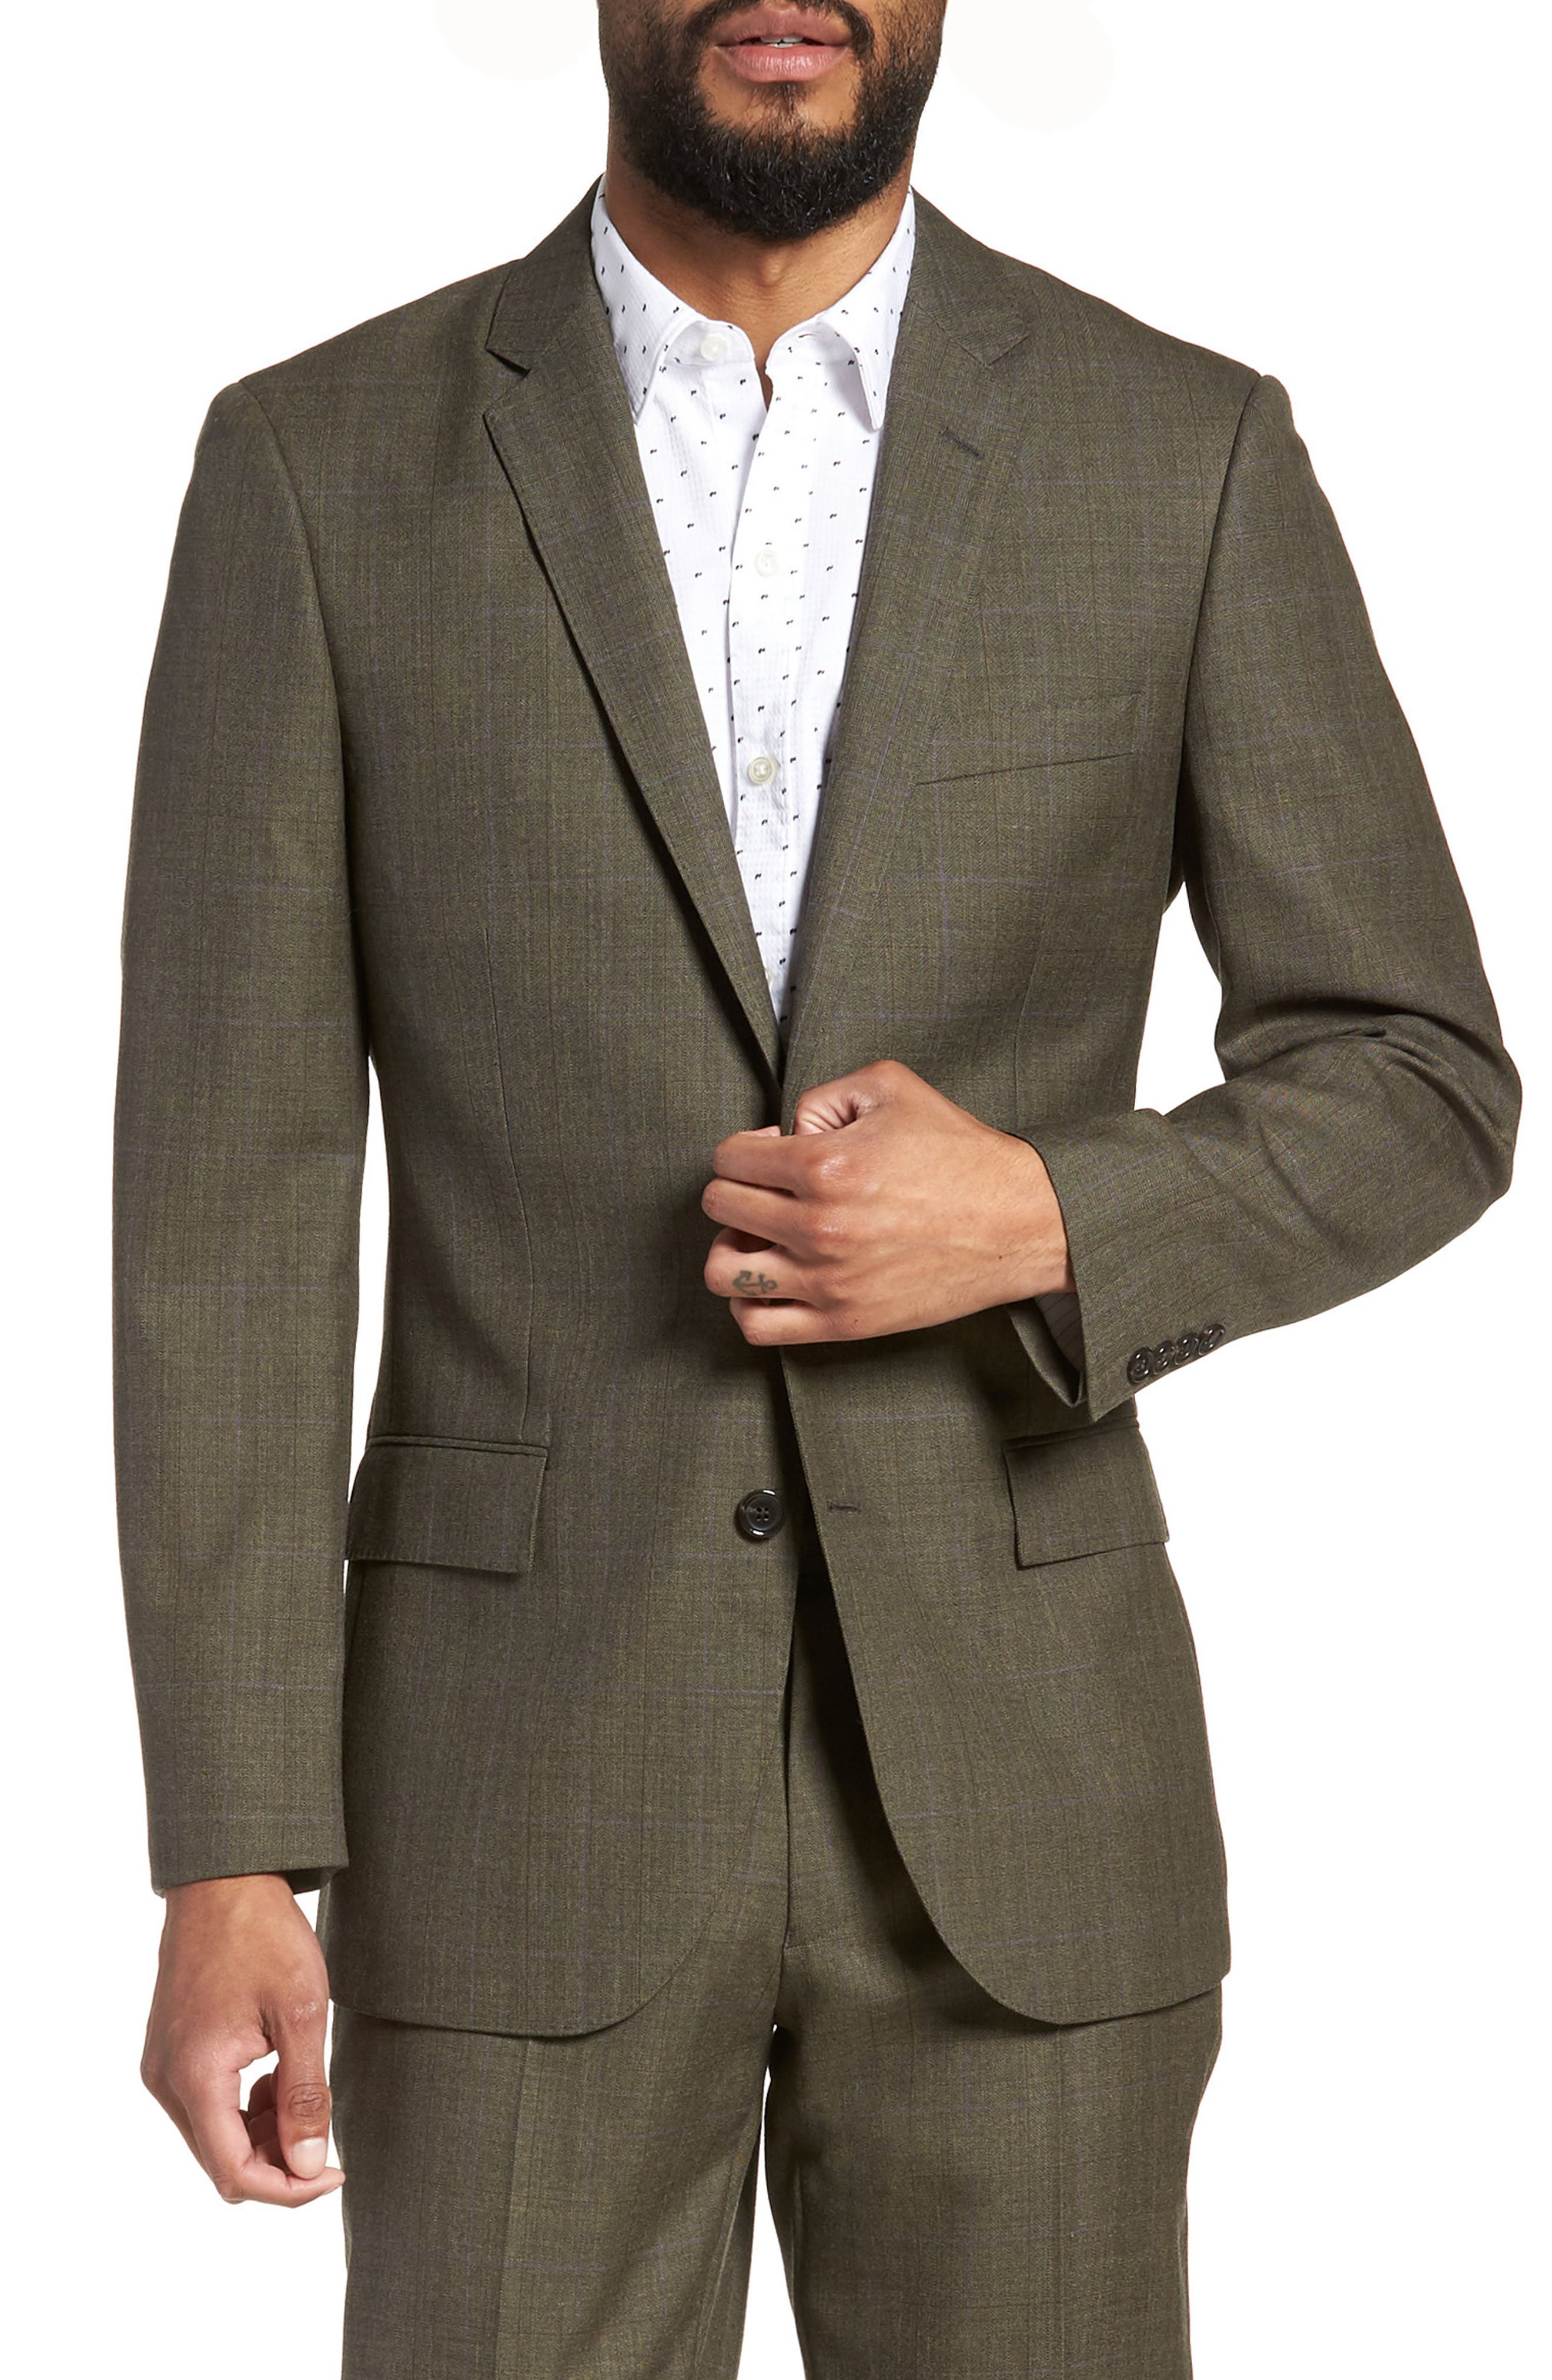 J.Crew Ludlow Trim Fit Herringbone Wool Sport Coat